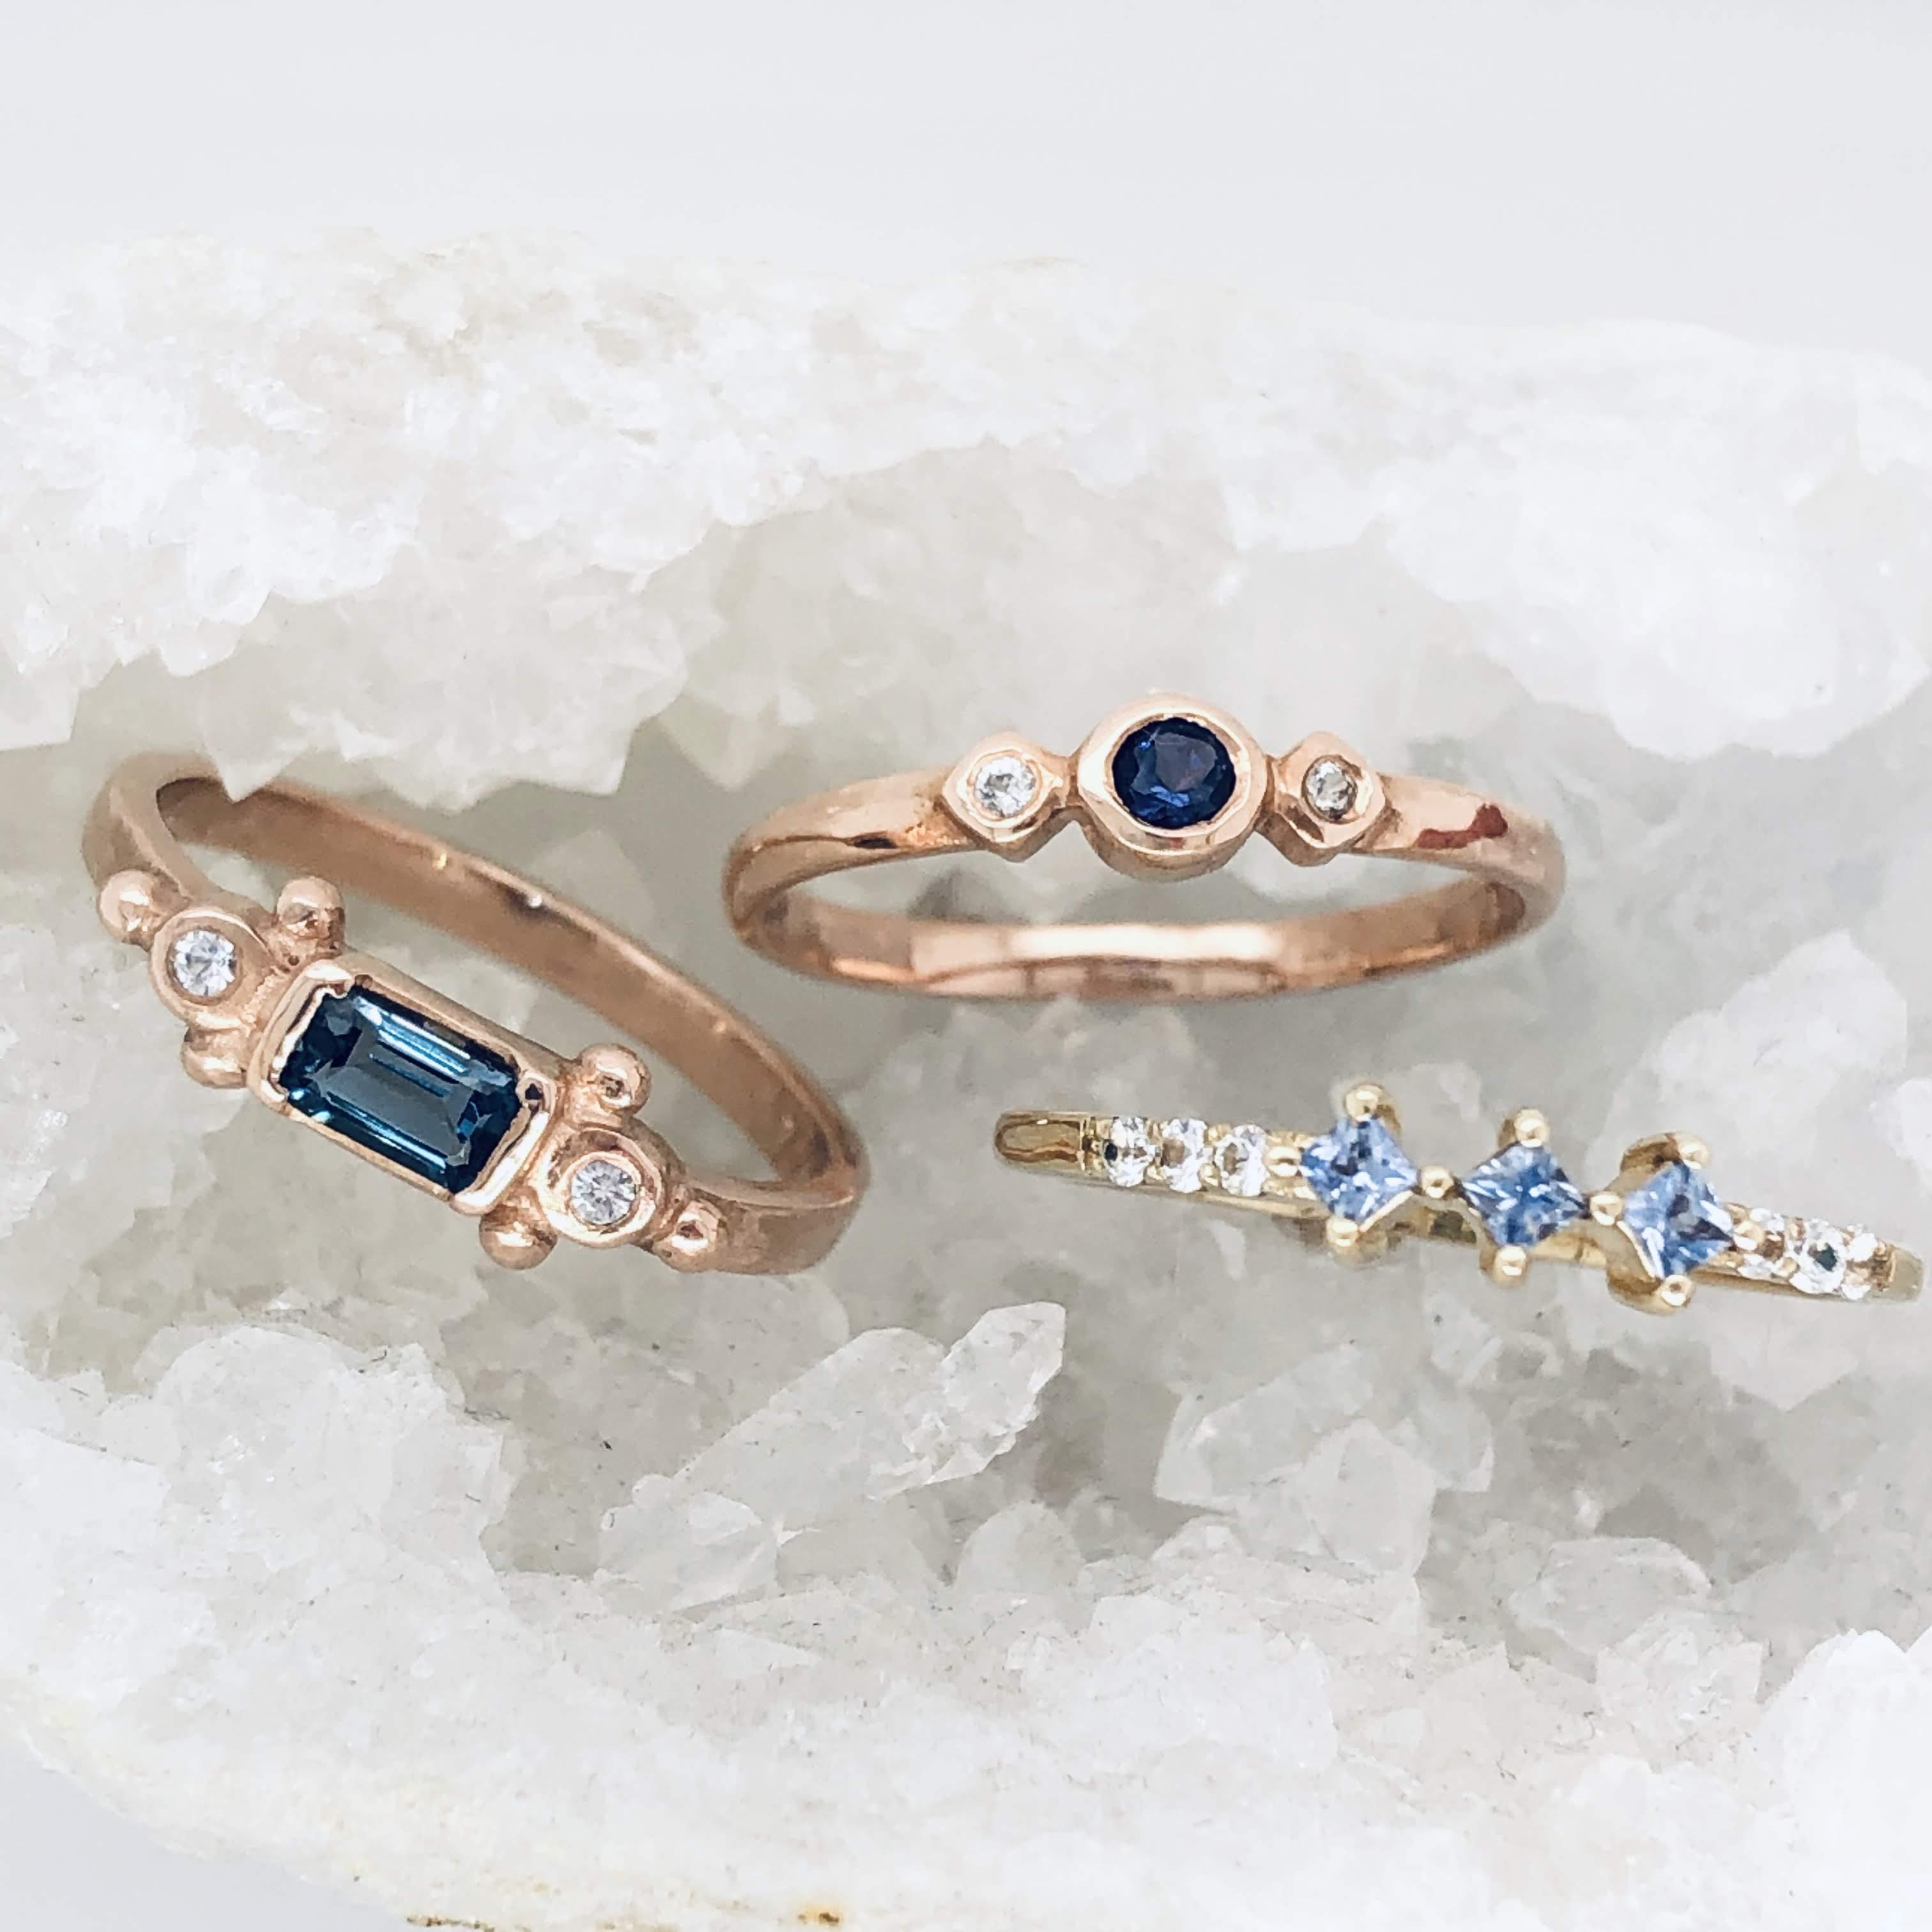 Thumbnail: CHARLOTTE - Ceylon Sapphire